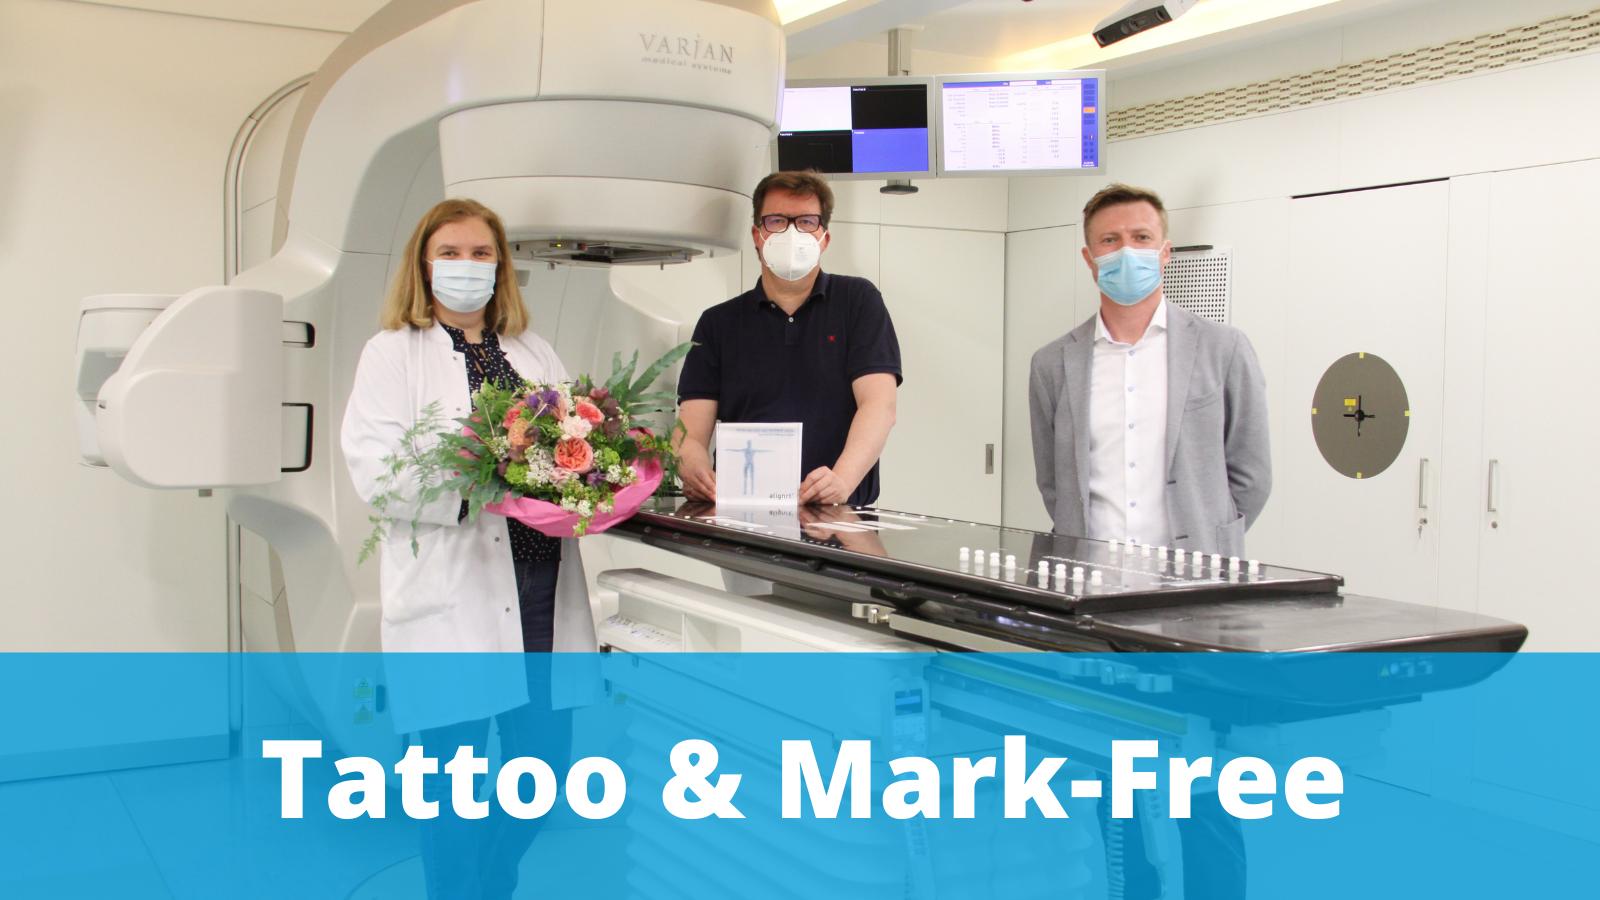 Sana Klinikum Offenbach go tattoo and mark-free with AlignRT